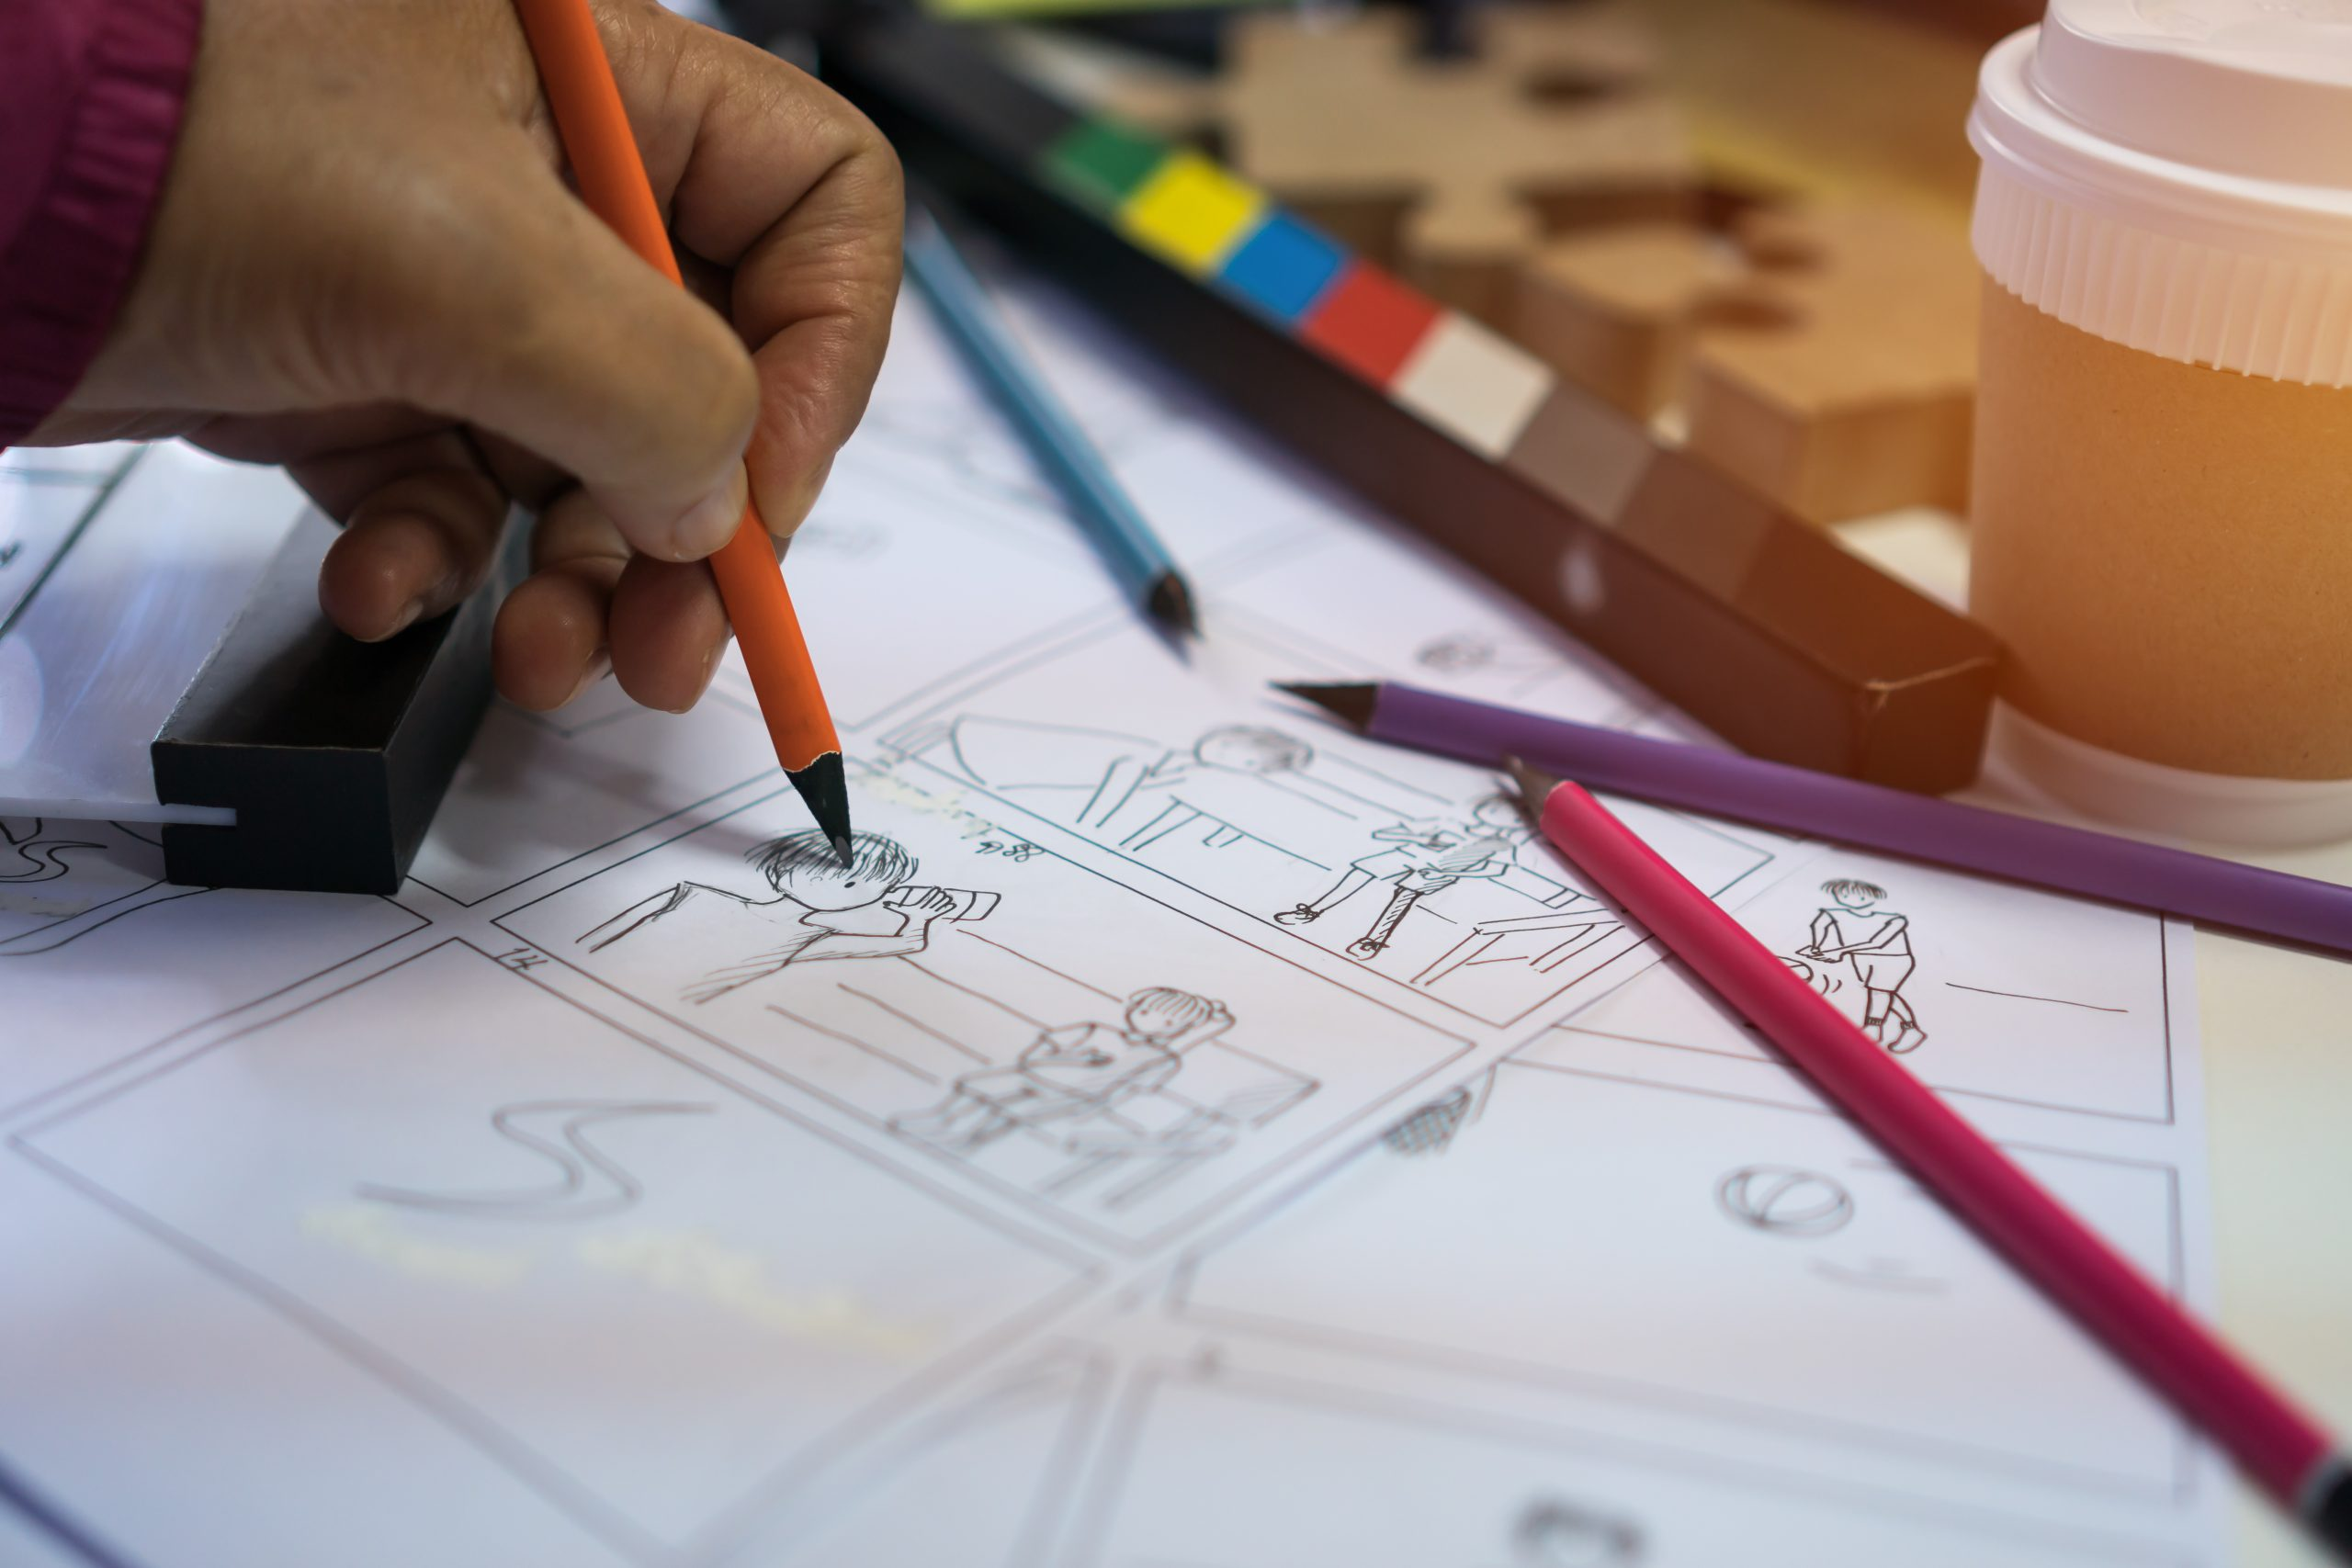 Storyboarding digital learning solutions